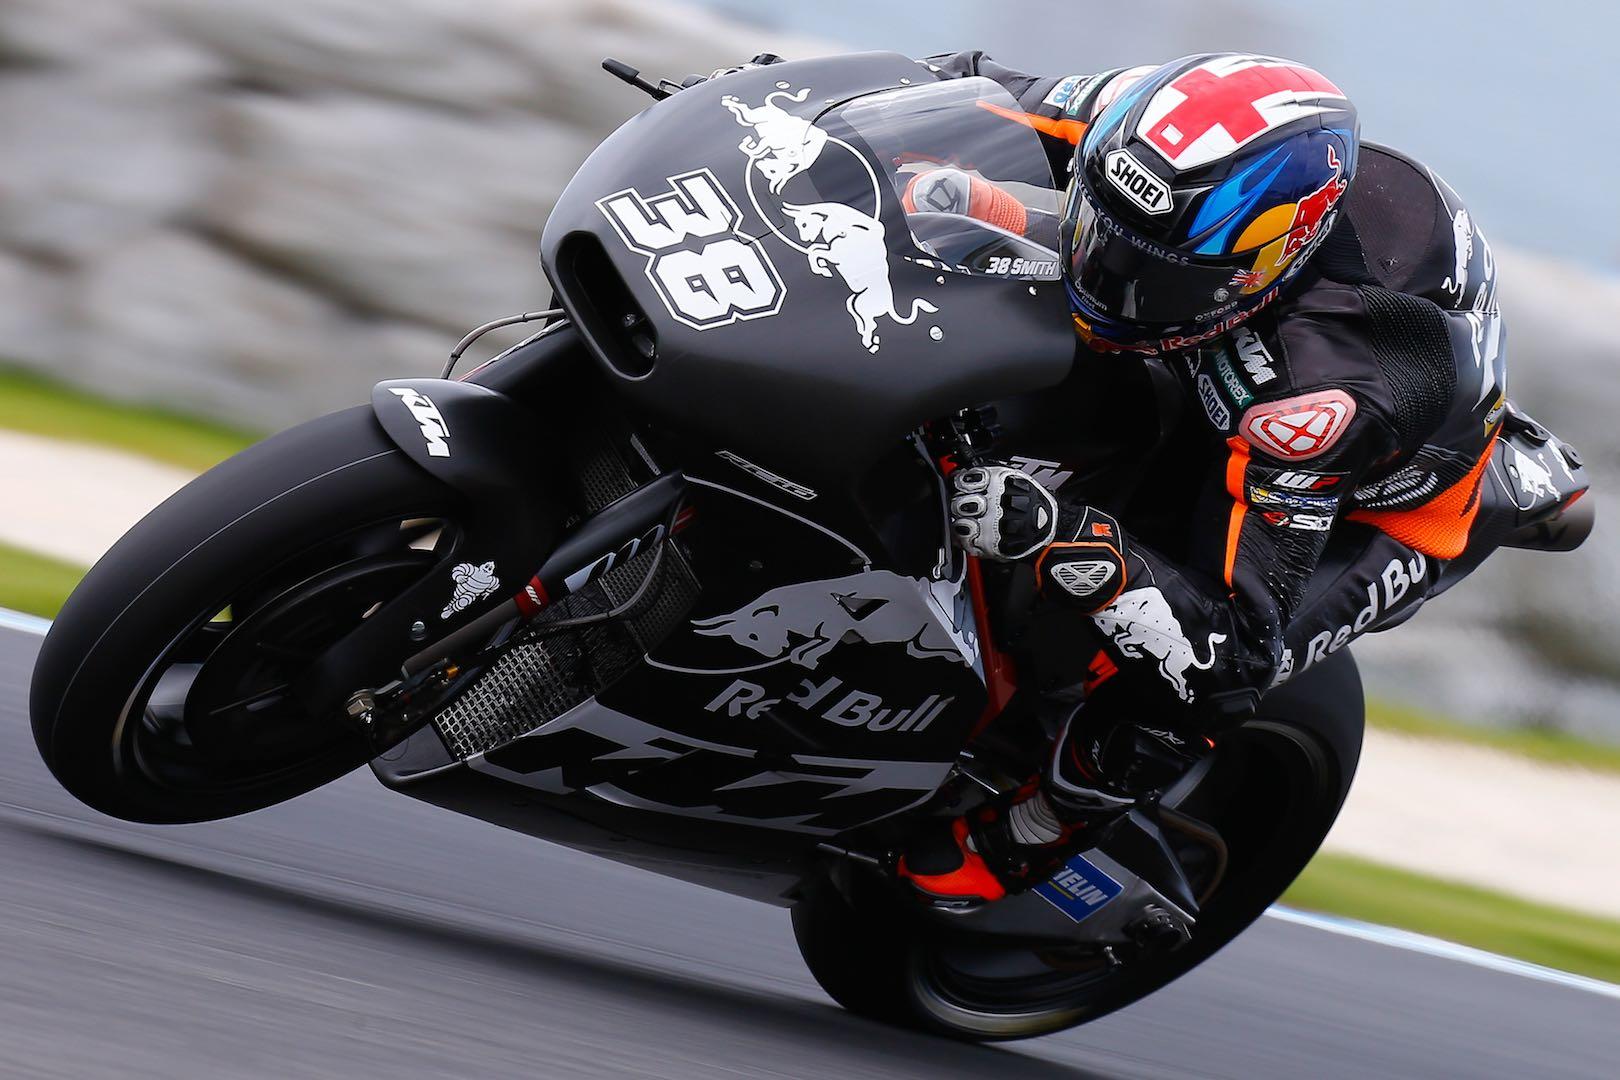 2017 Phillip Island MotoGP Test: KTM's Bradley Smith